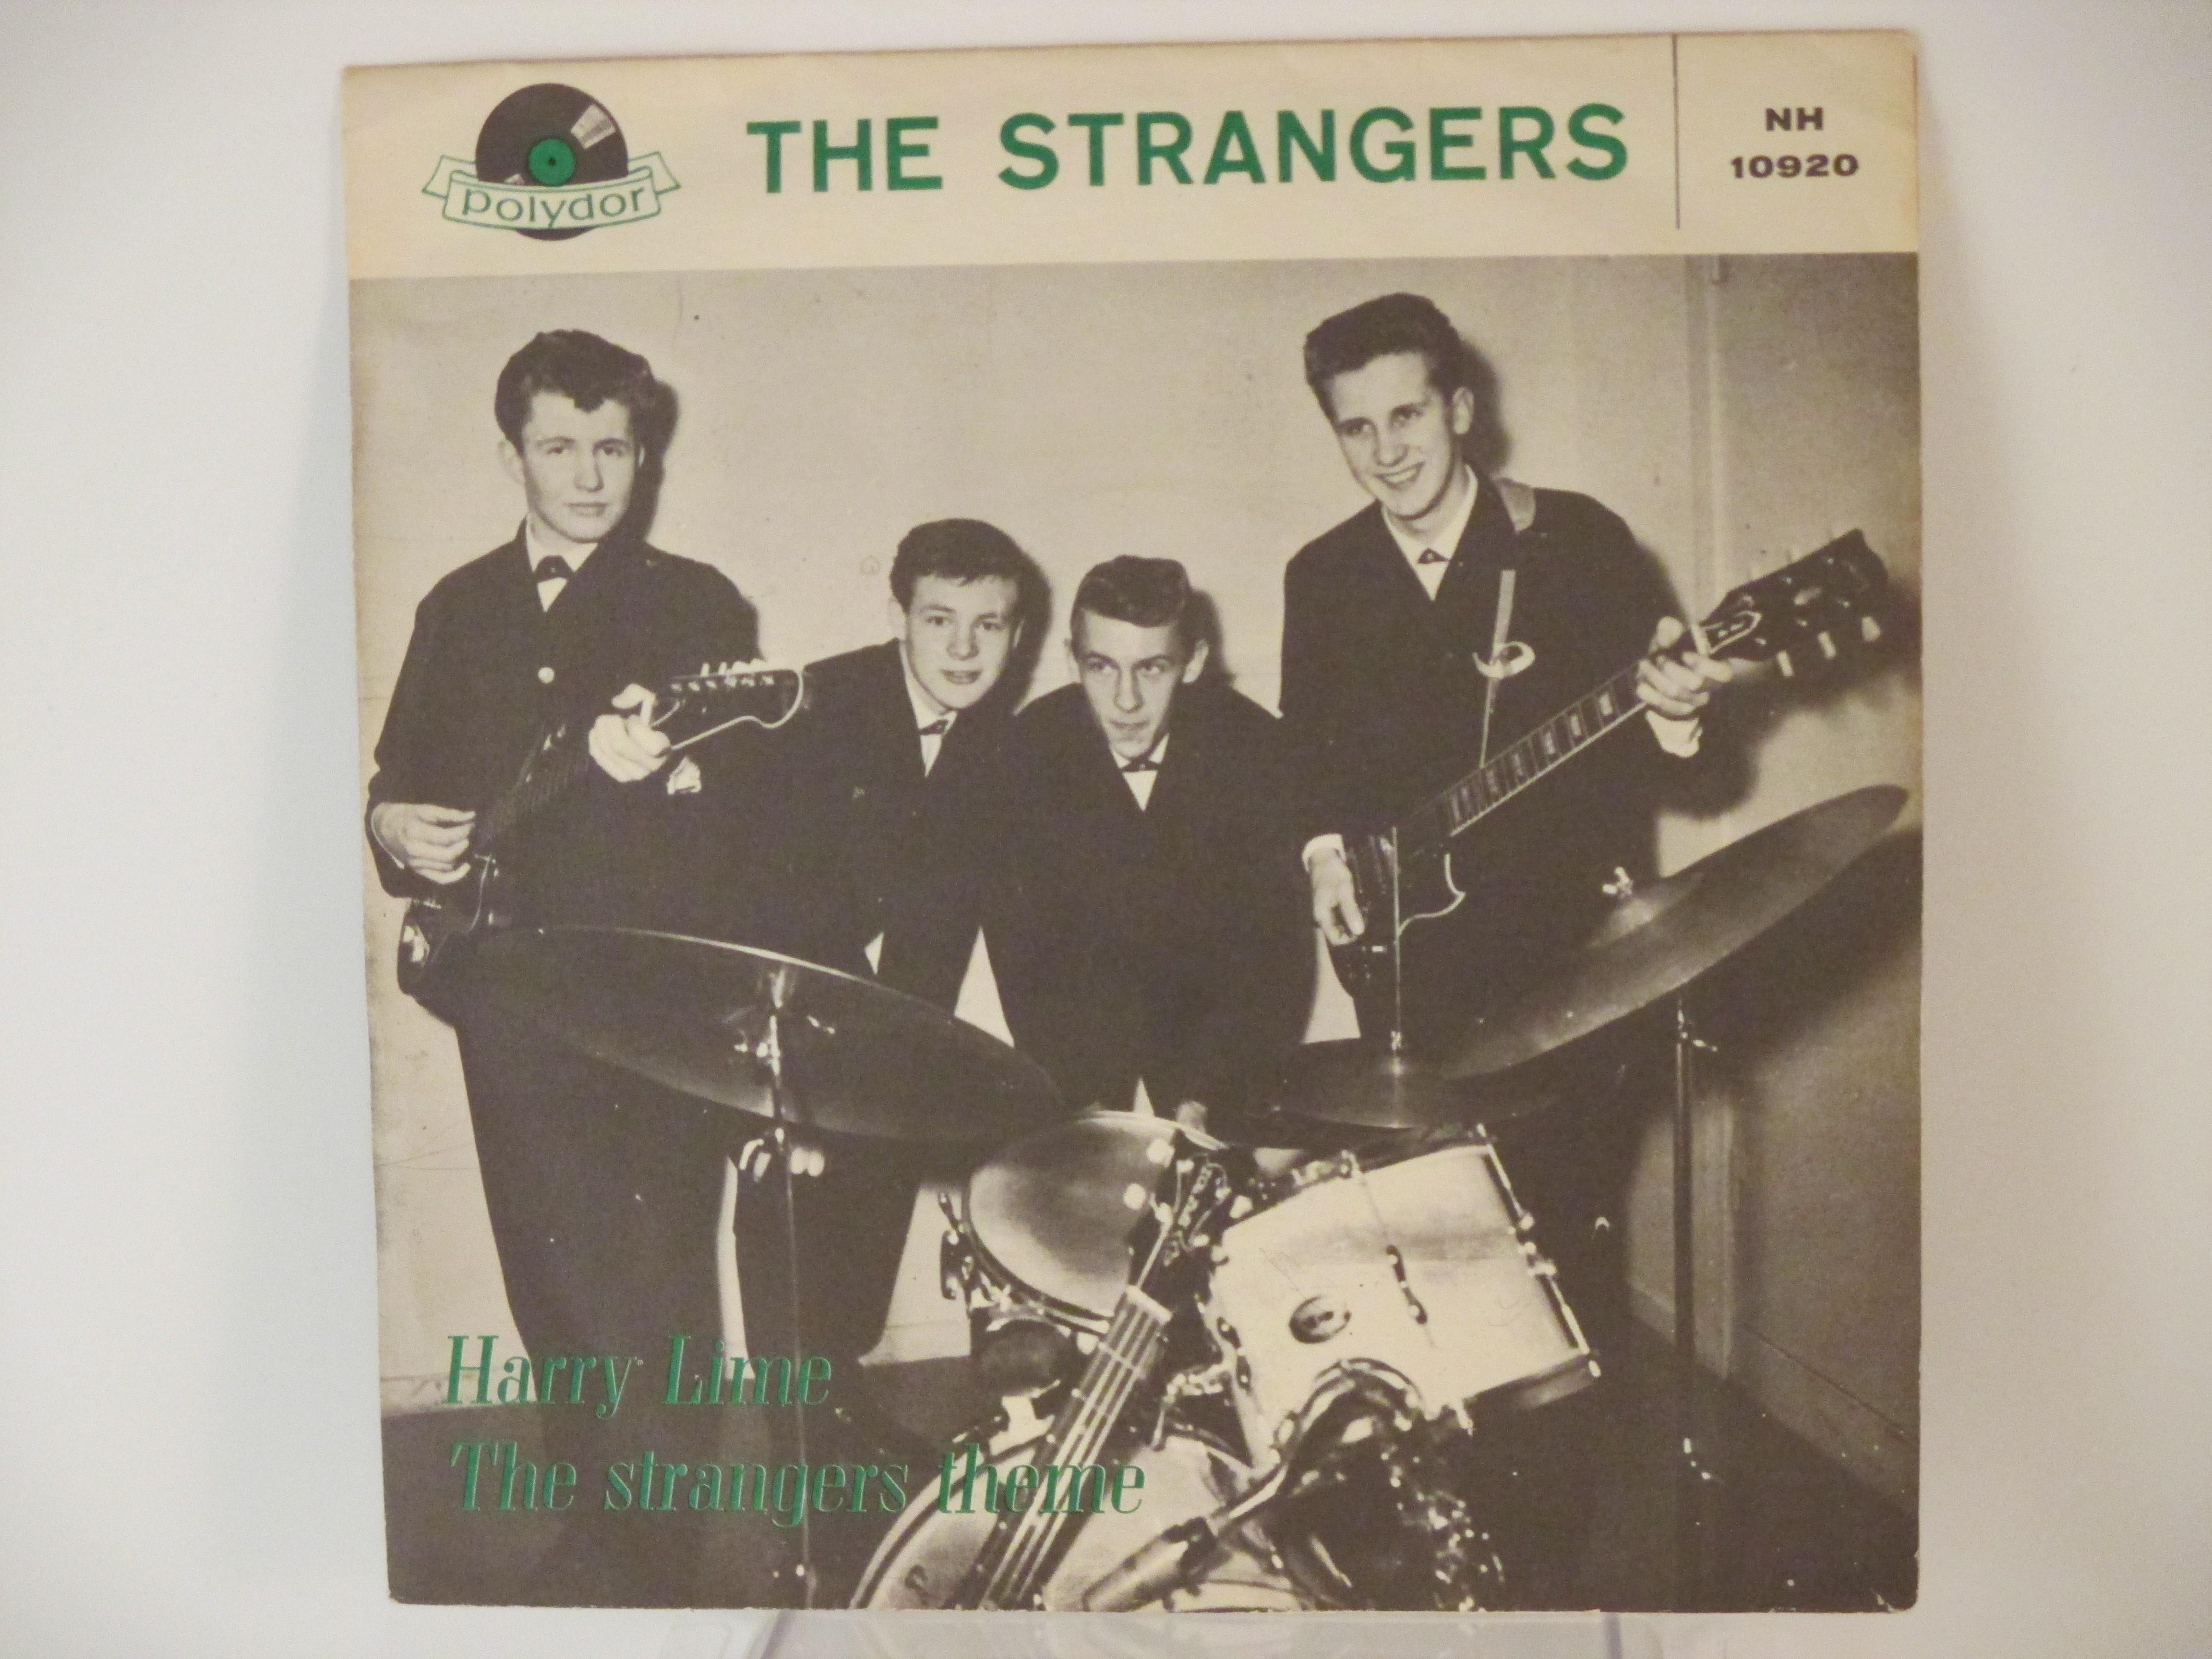 STRANGERS : Harry Lime / The strangers theme